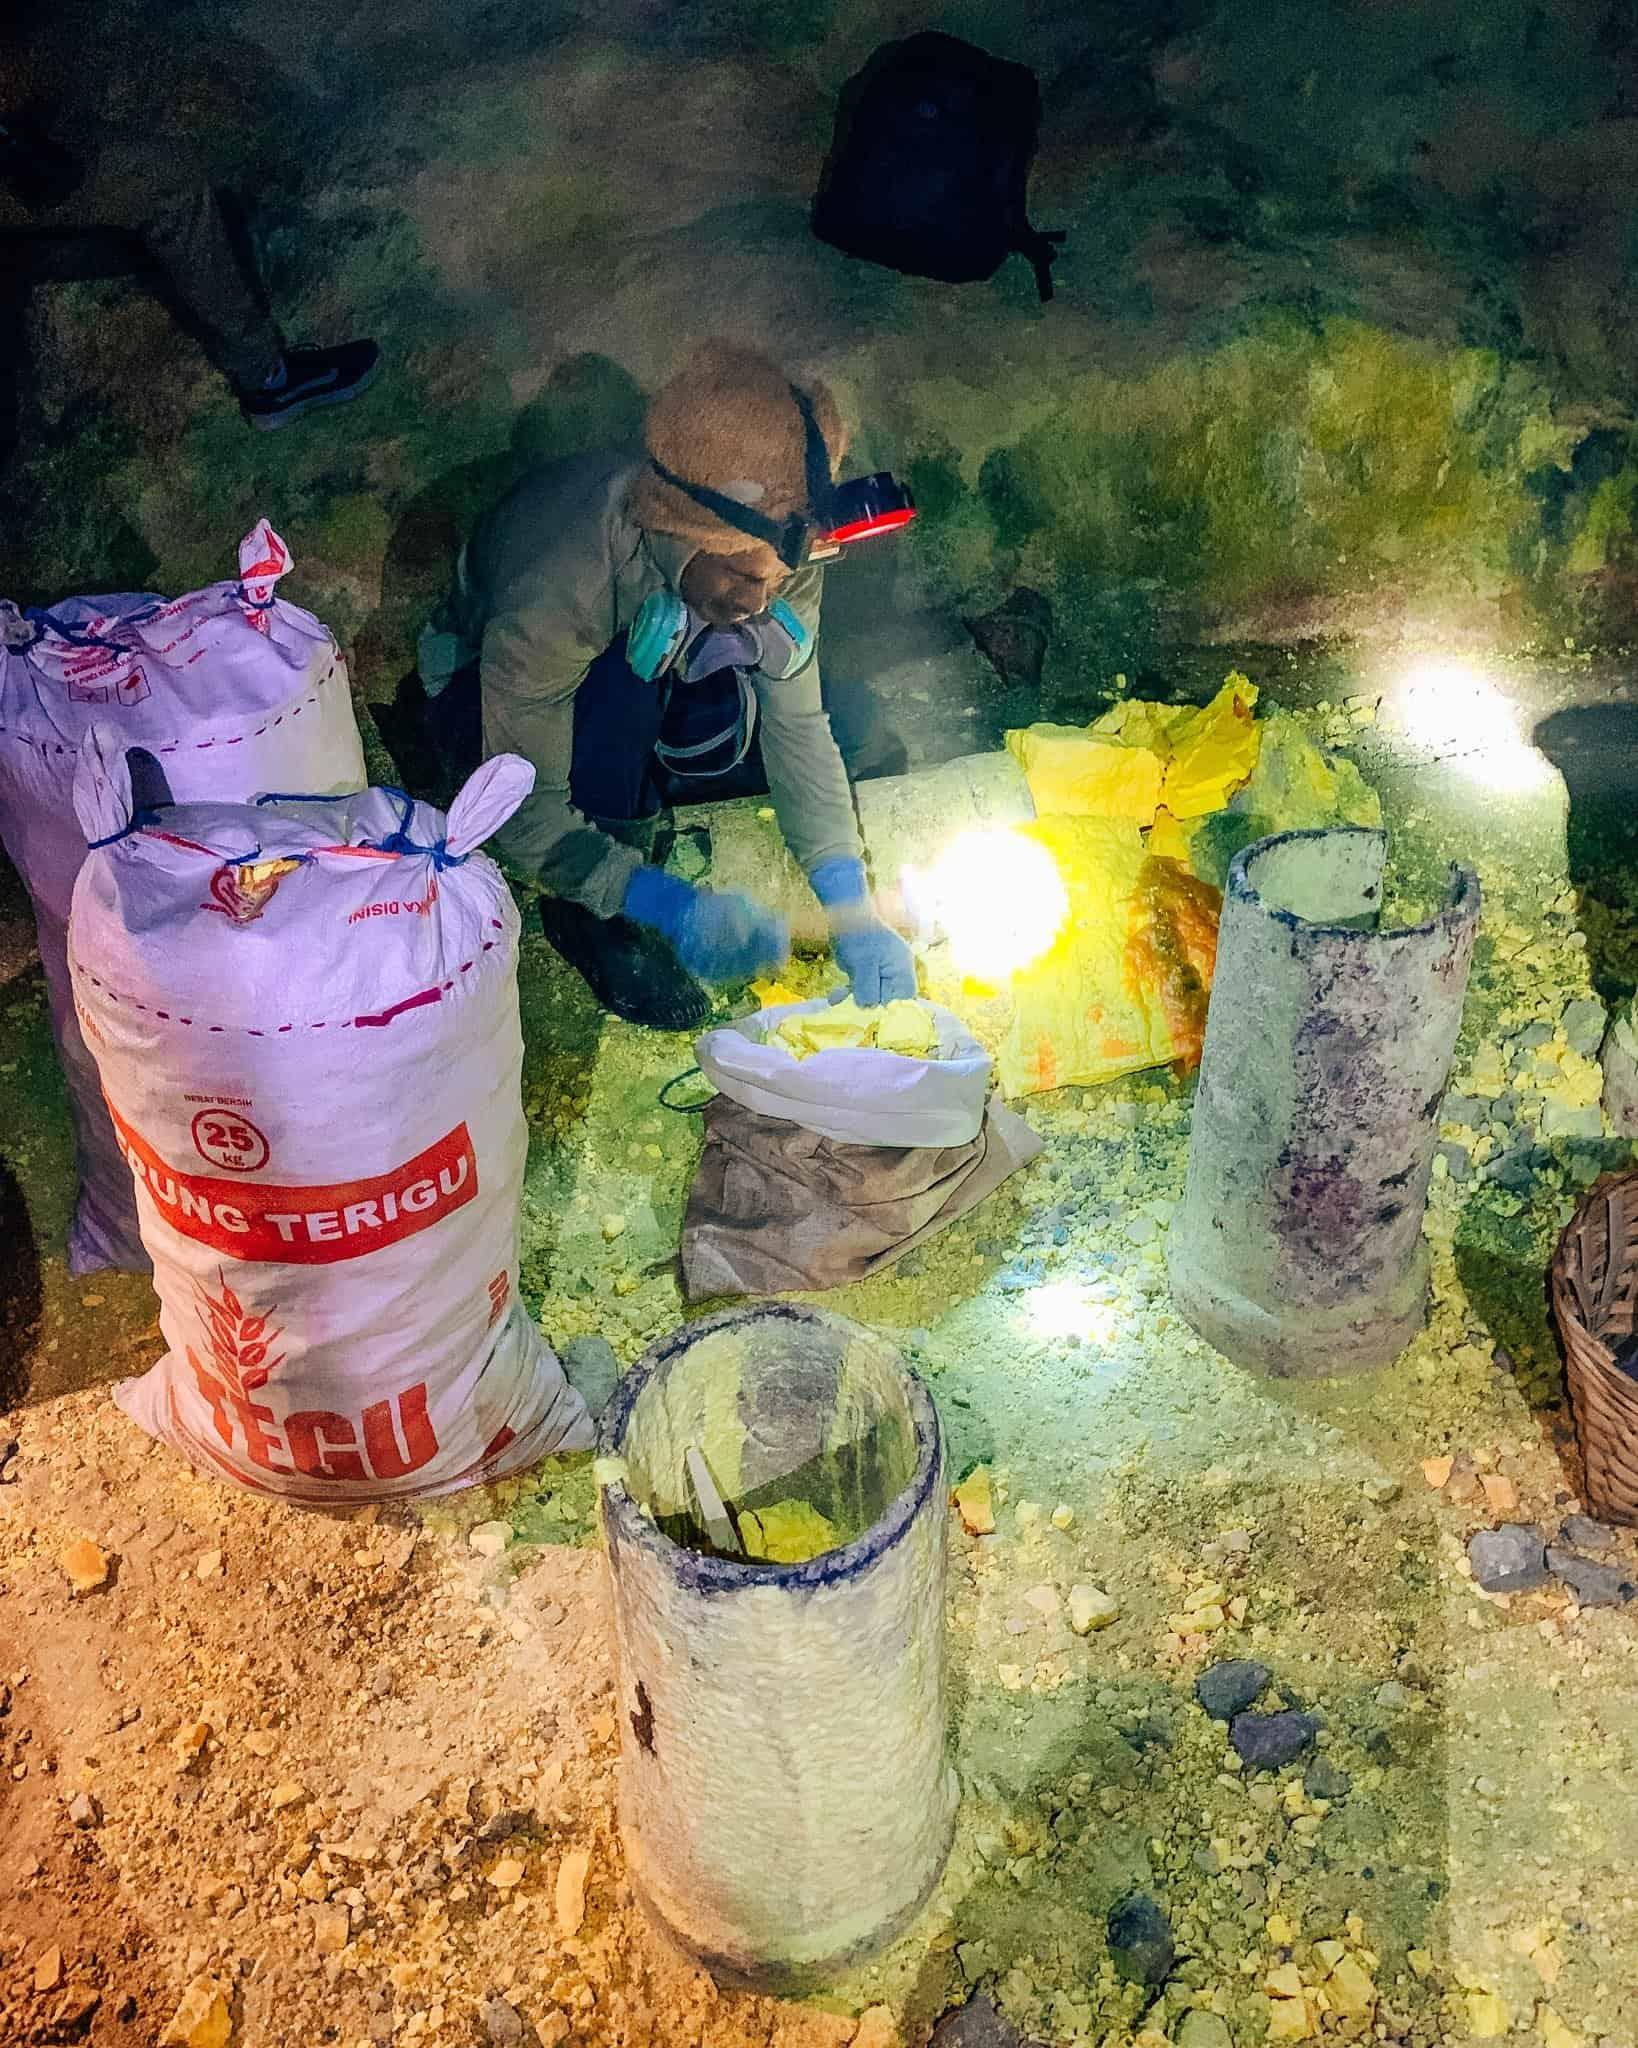 Sulfur Mine Worker at Mount Ijen, East Java - The Next Trip